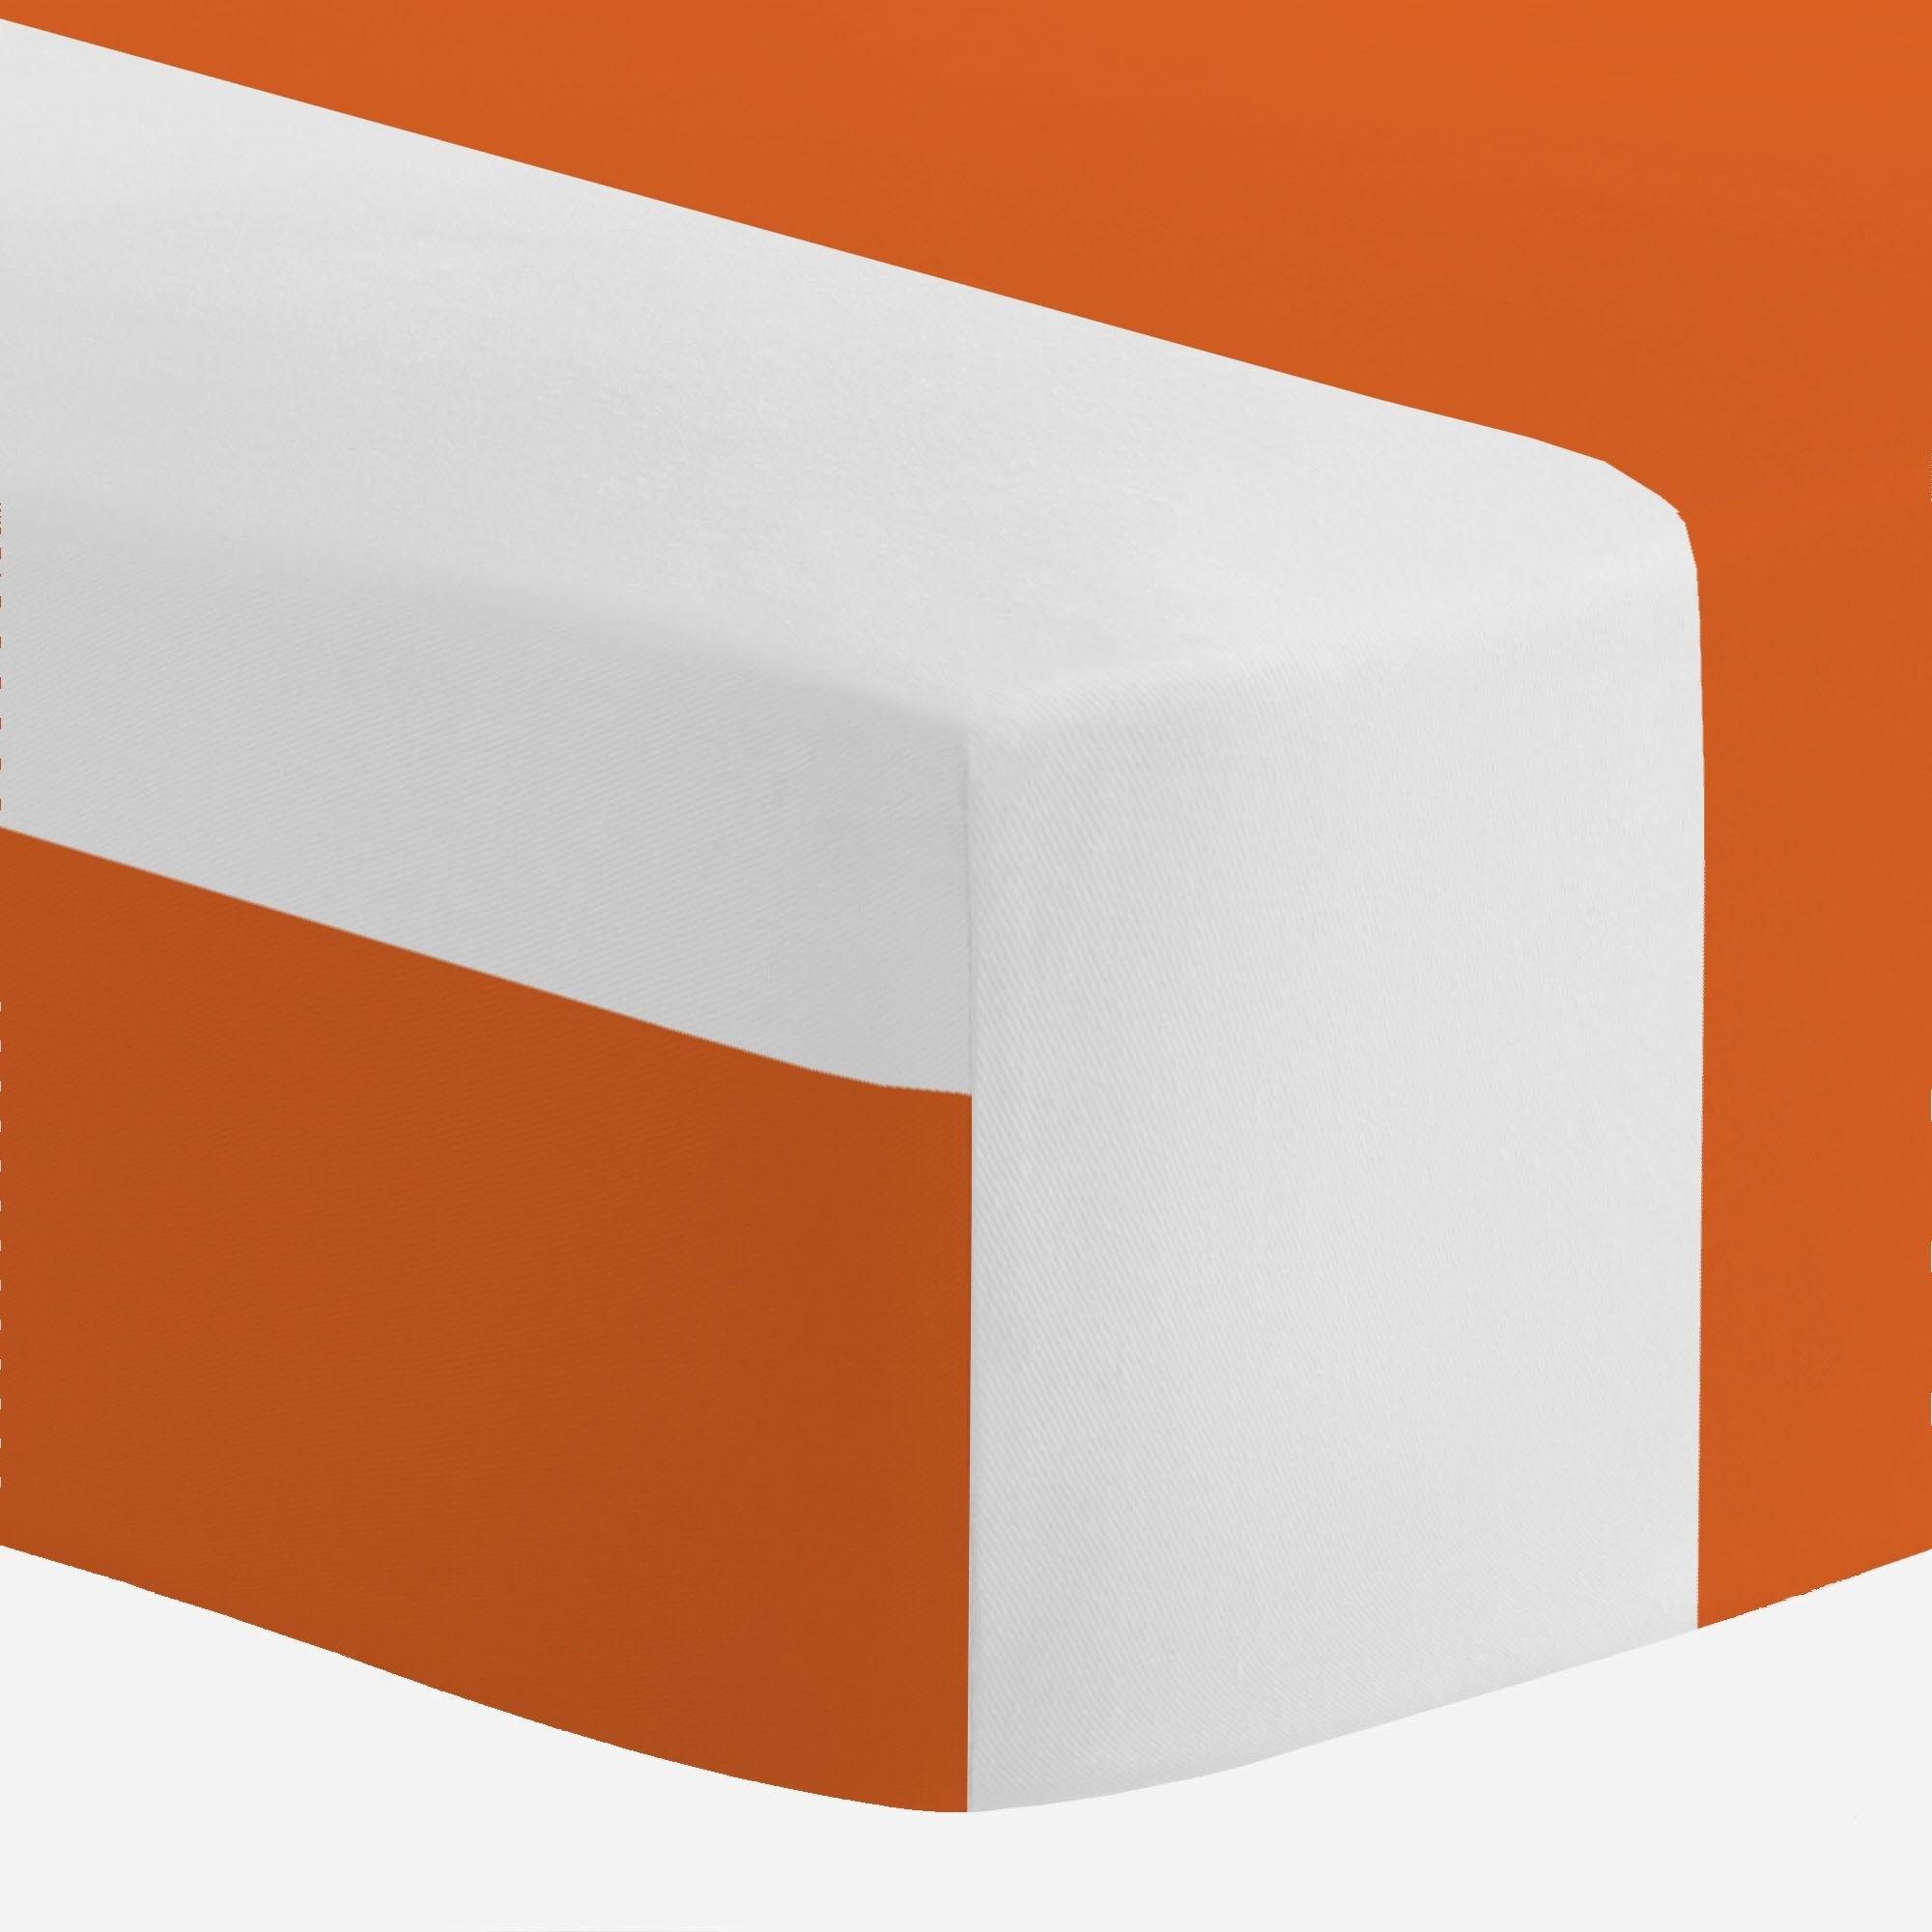 Carousel Designs College Orange Horizontal Stripe Crib Sheet - Organic 100% Cotton Fitted Crib Sheet - Made in the USA